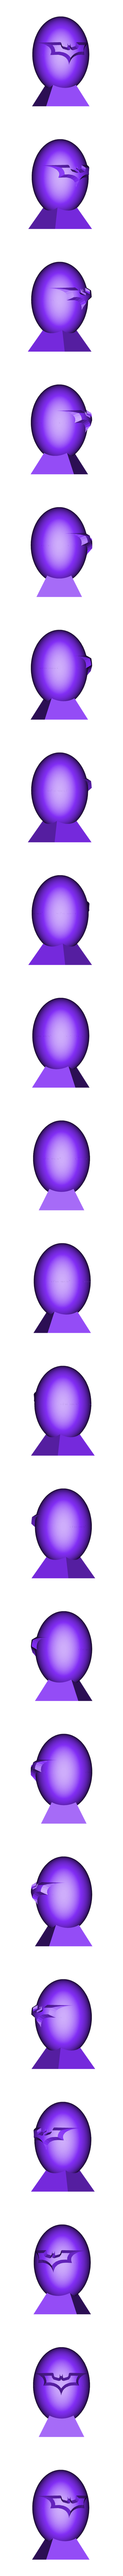 Super oeufs batman.stl Download free STL file Super Eggs Collection with base • 3D printer object, psl